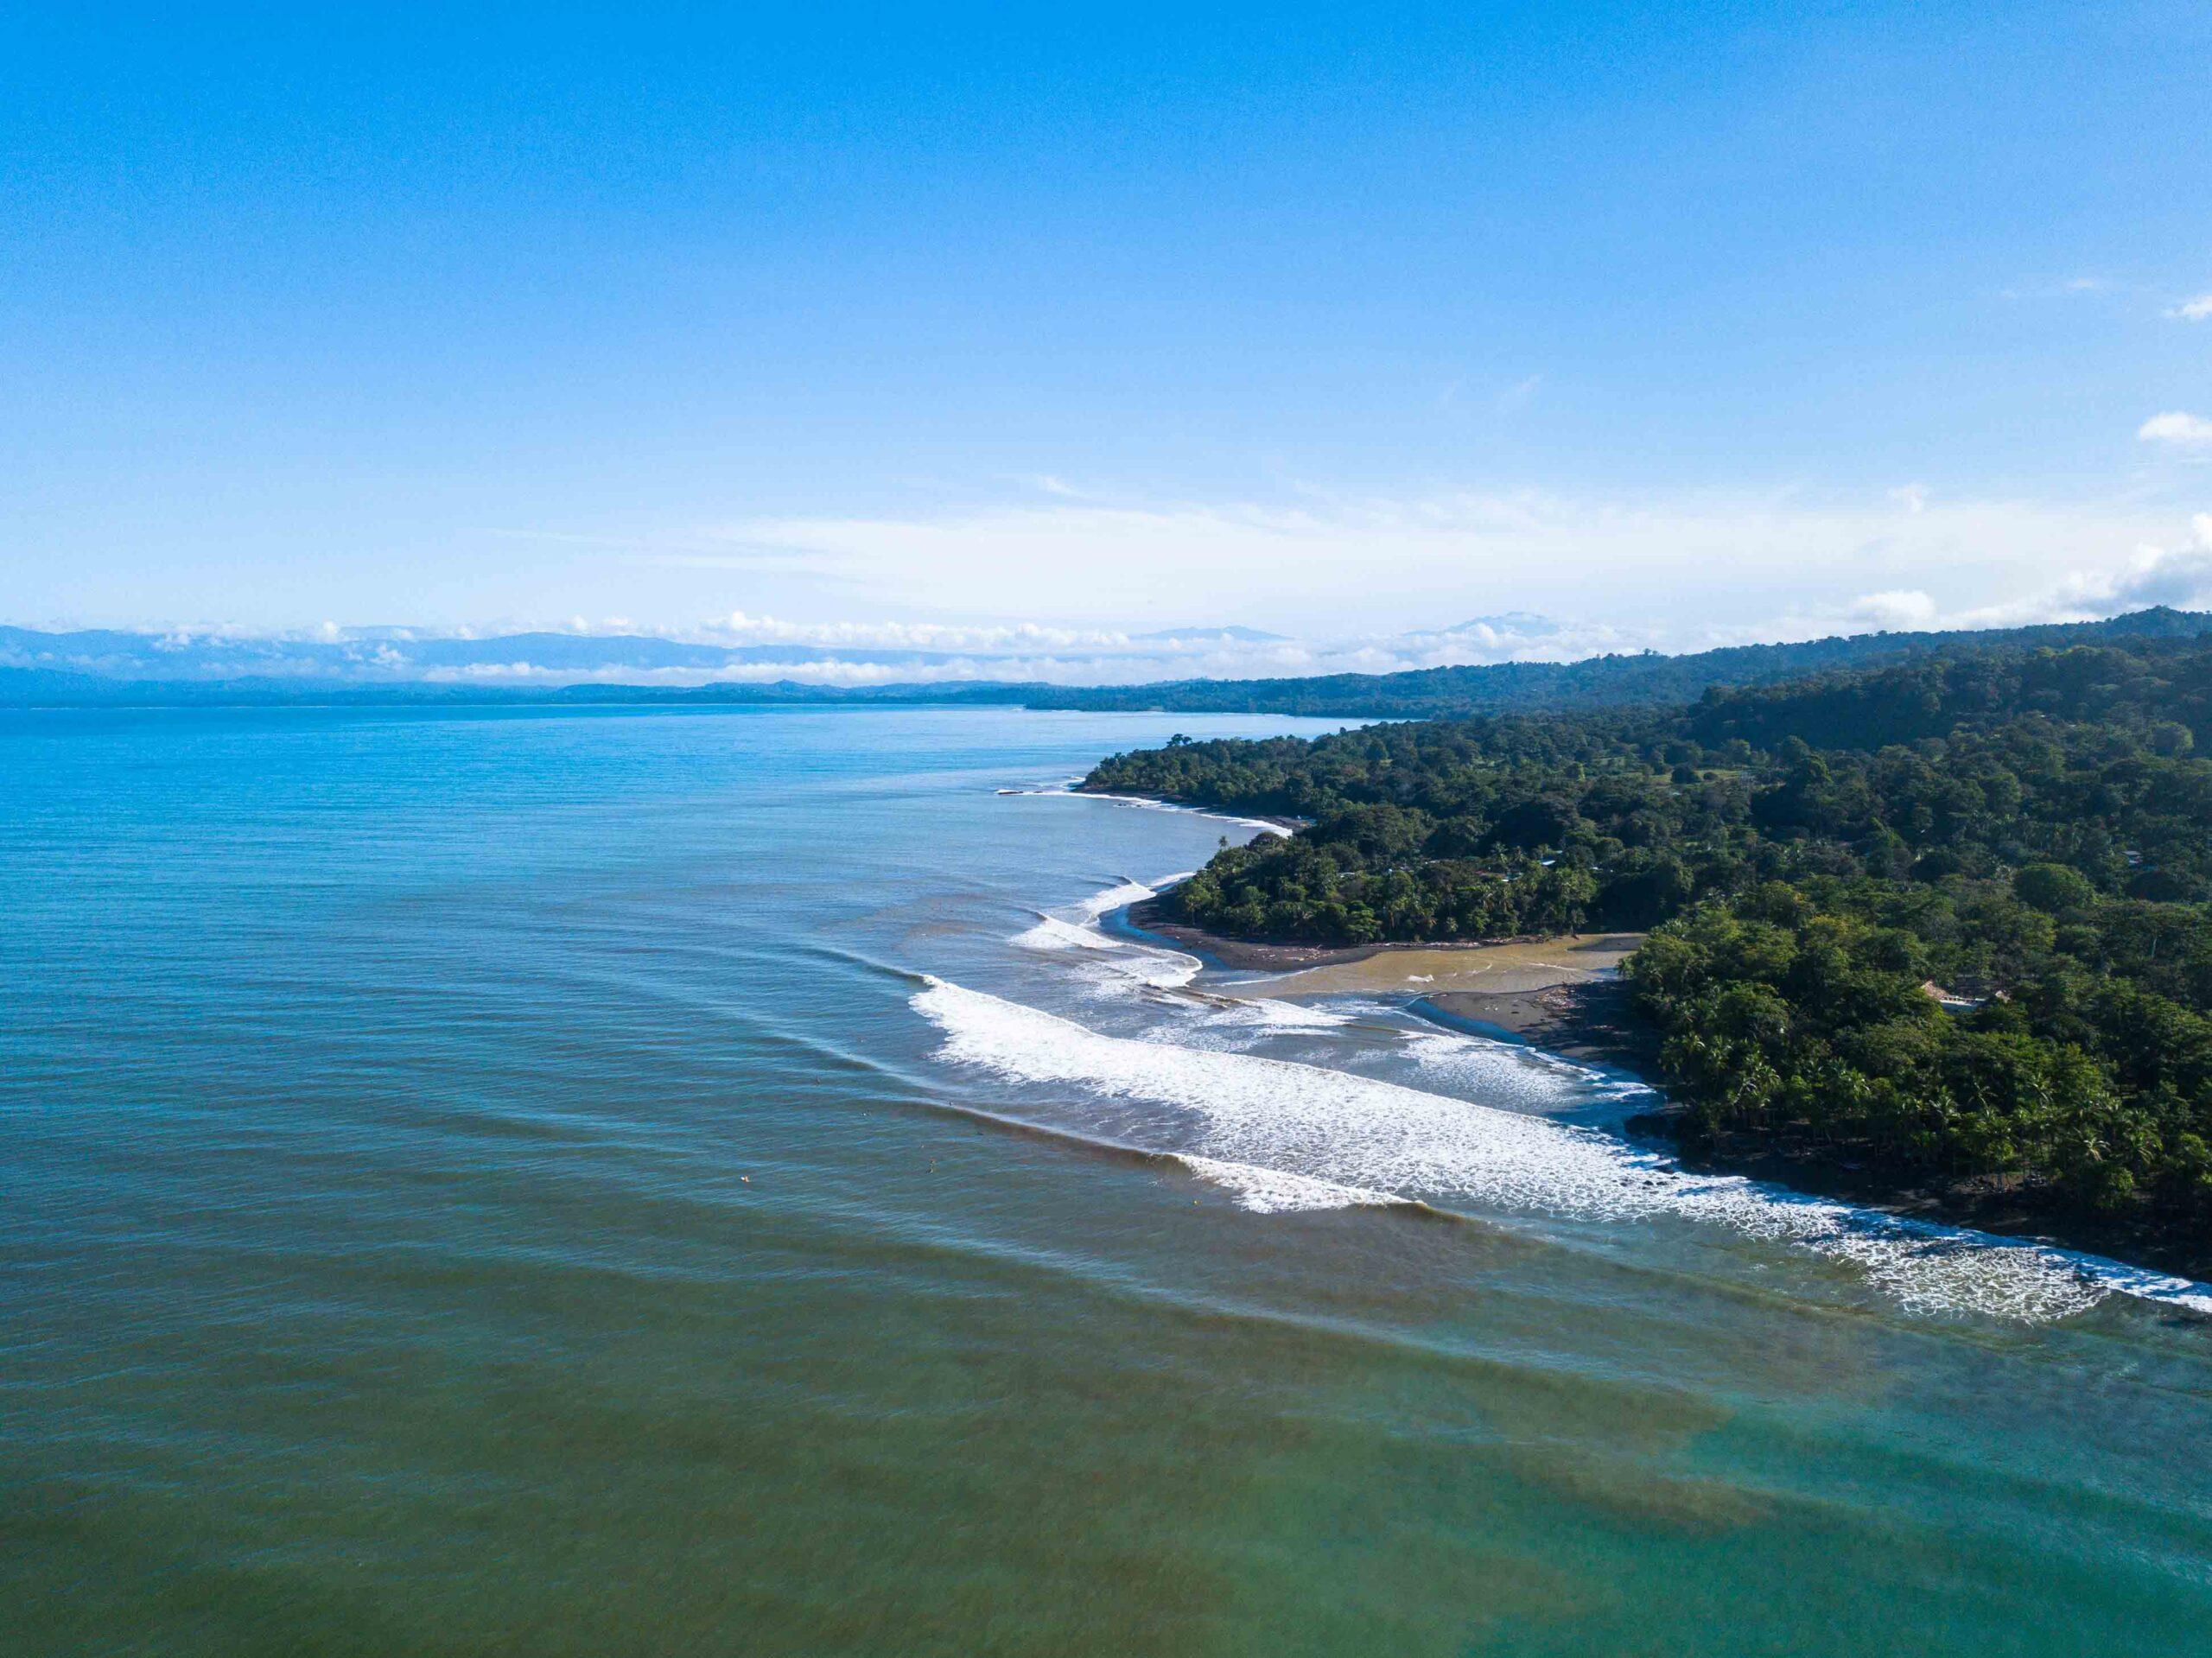 Drone photo of Pavones Costa Rica